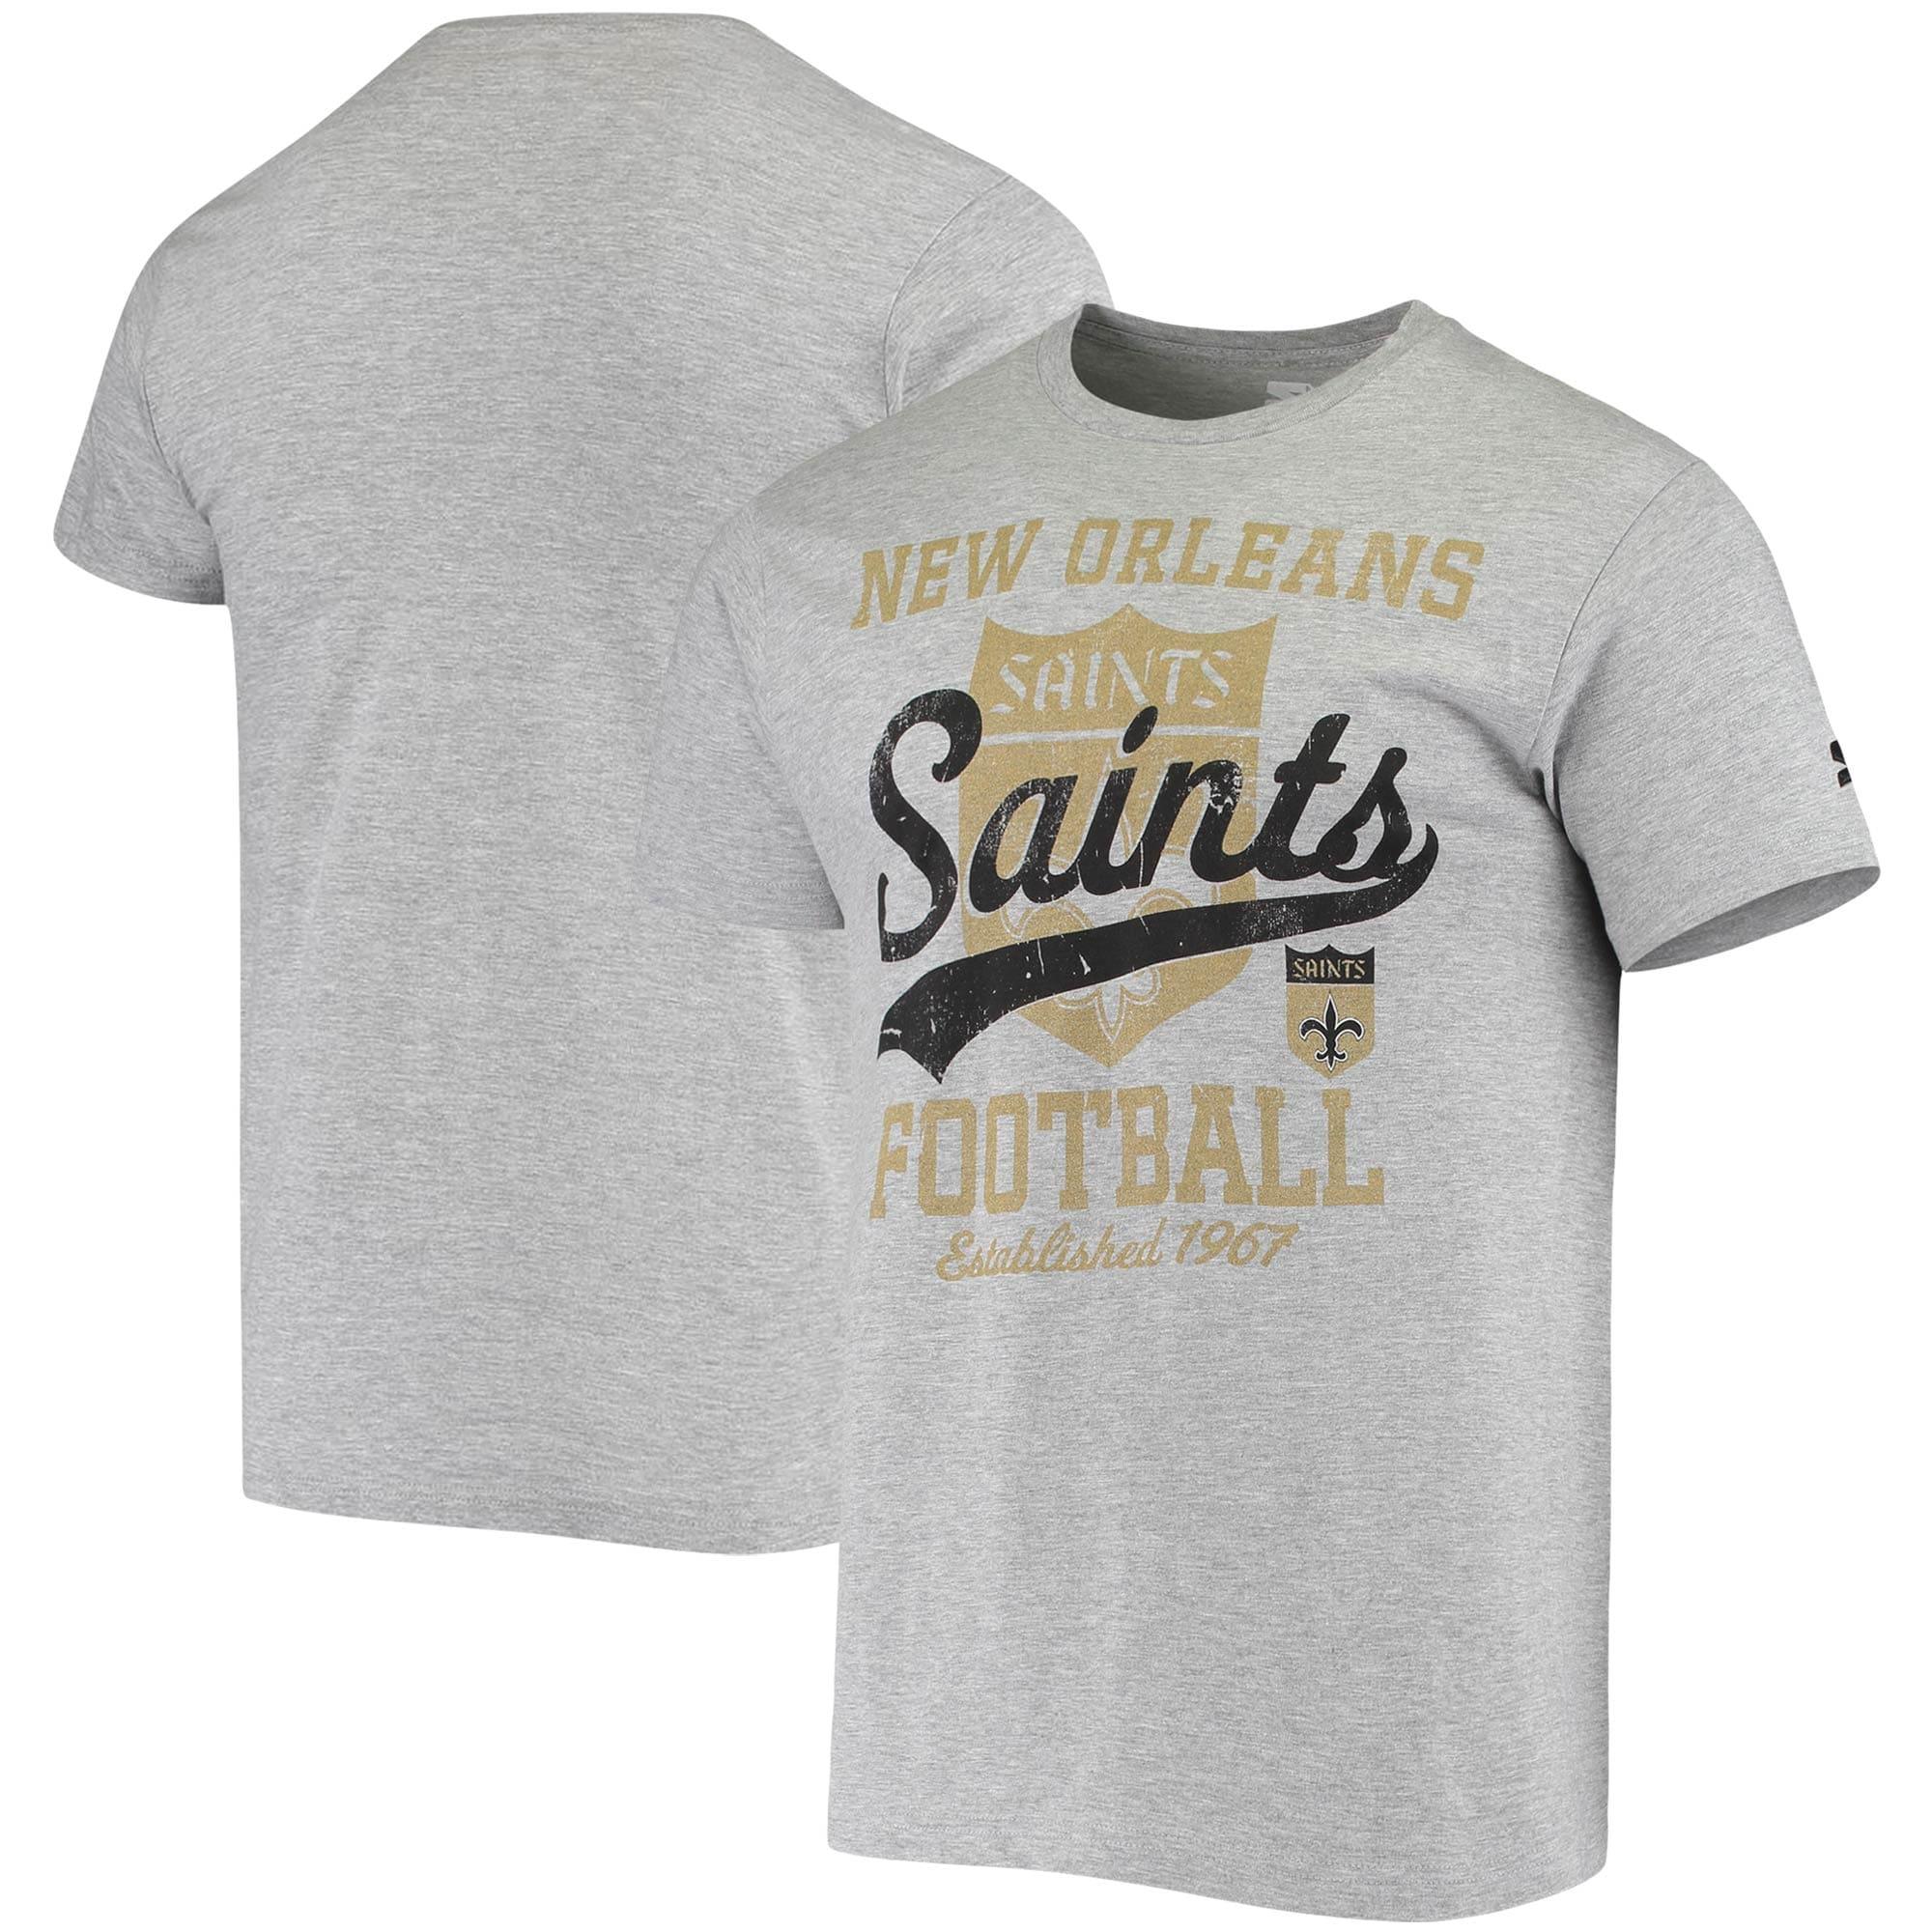 New Orleans Saints Starter Blitz Throwback T-Shirt - Heathered Gray